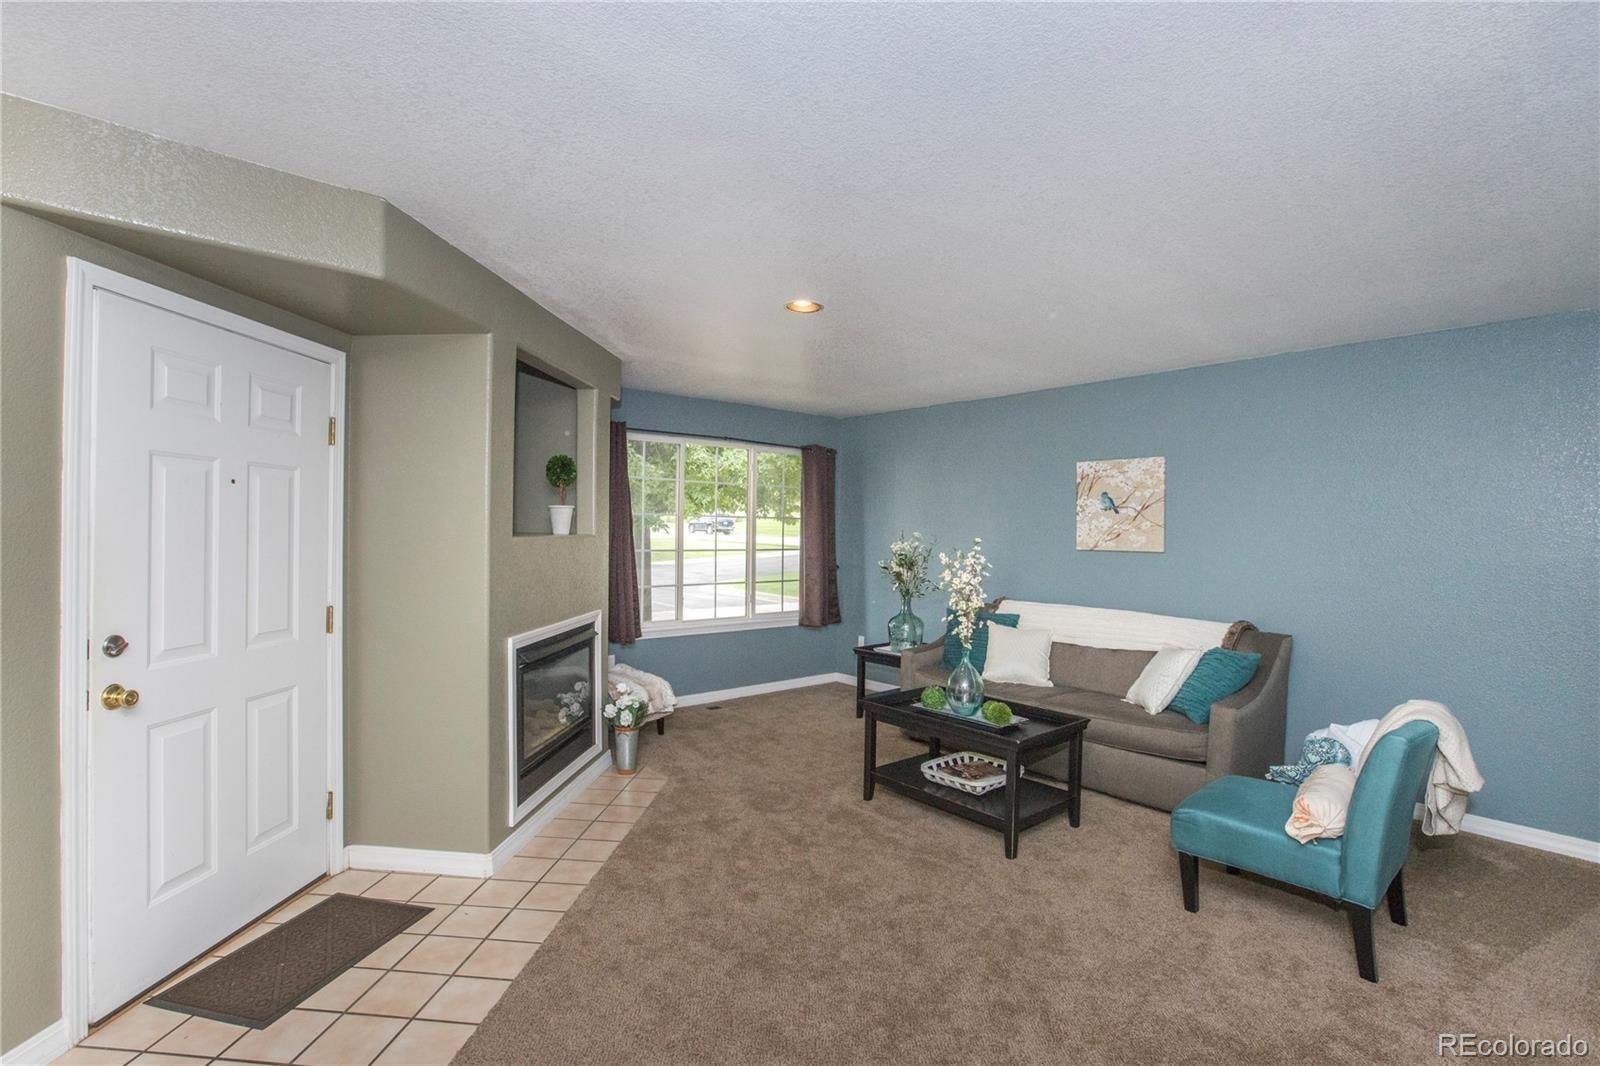 MLS# 3758449 - 4 - 6802 Antigua Drive #26, Fort Collins, CO 80525